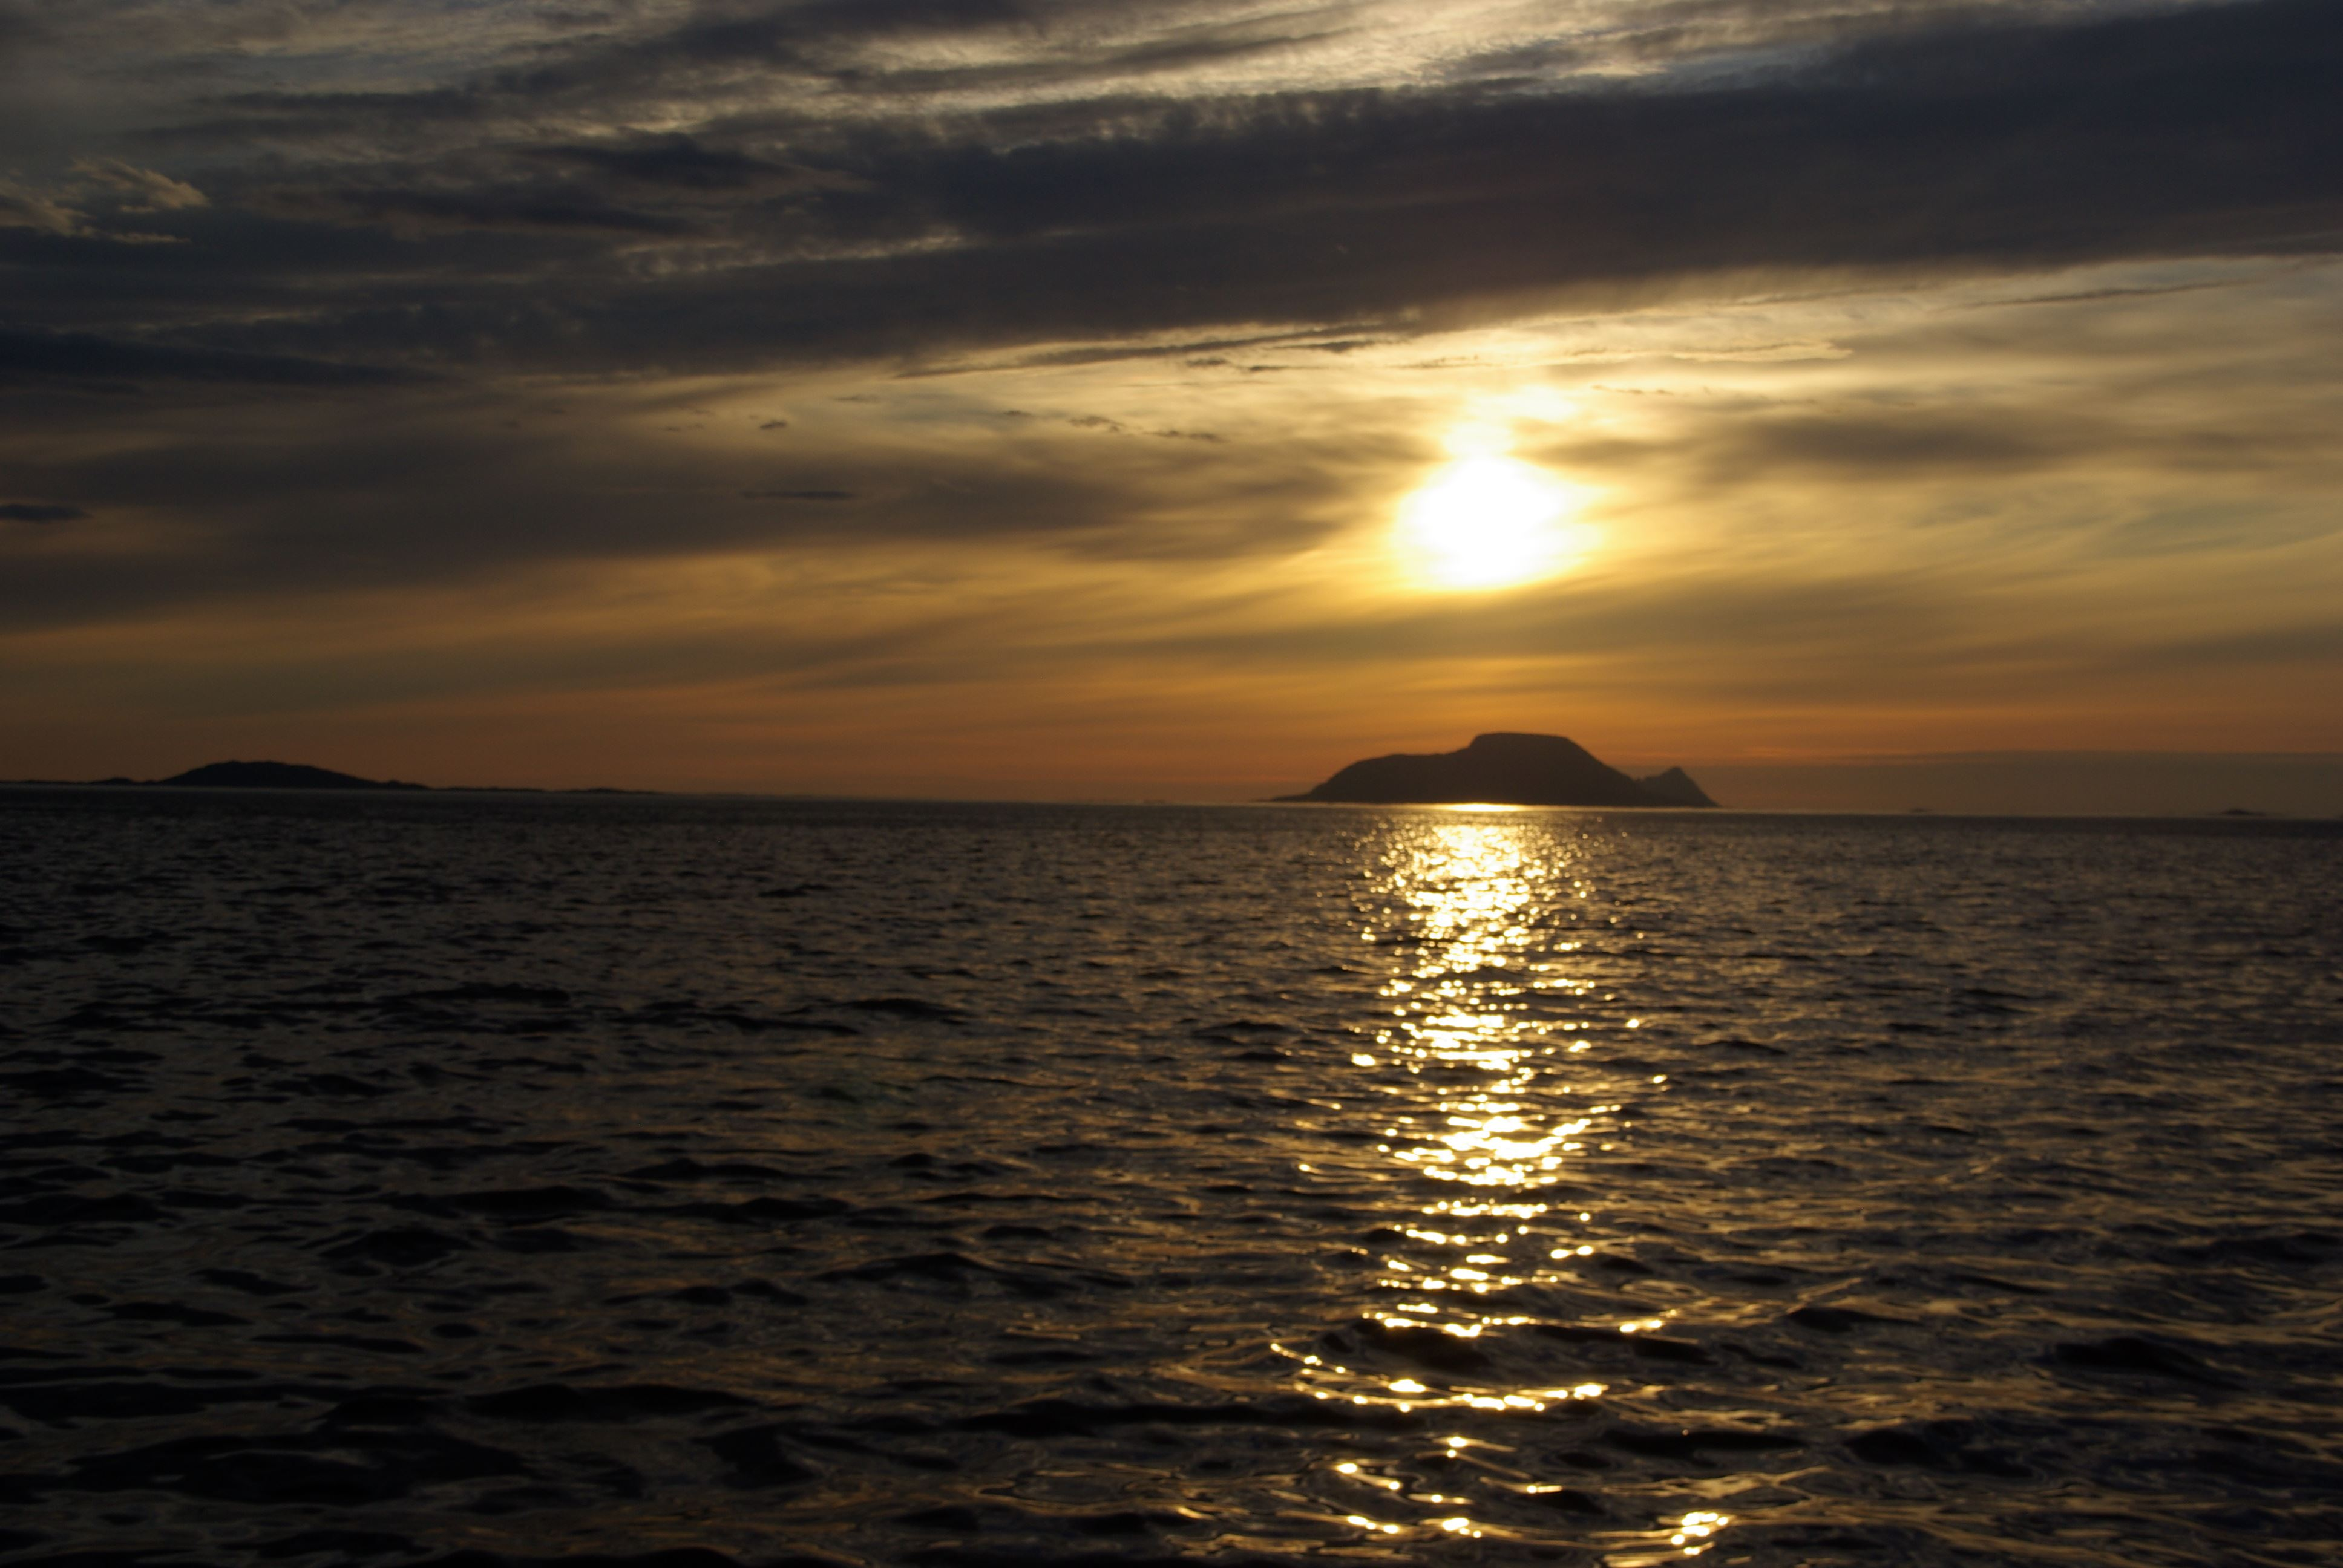 Midnight sun cruise with MS Senjafjell - Solbø Maritime